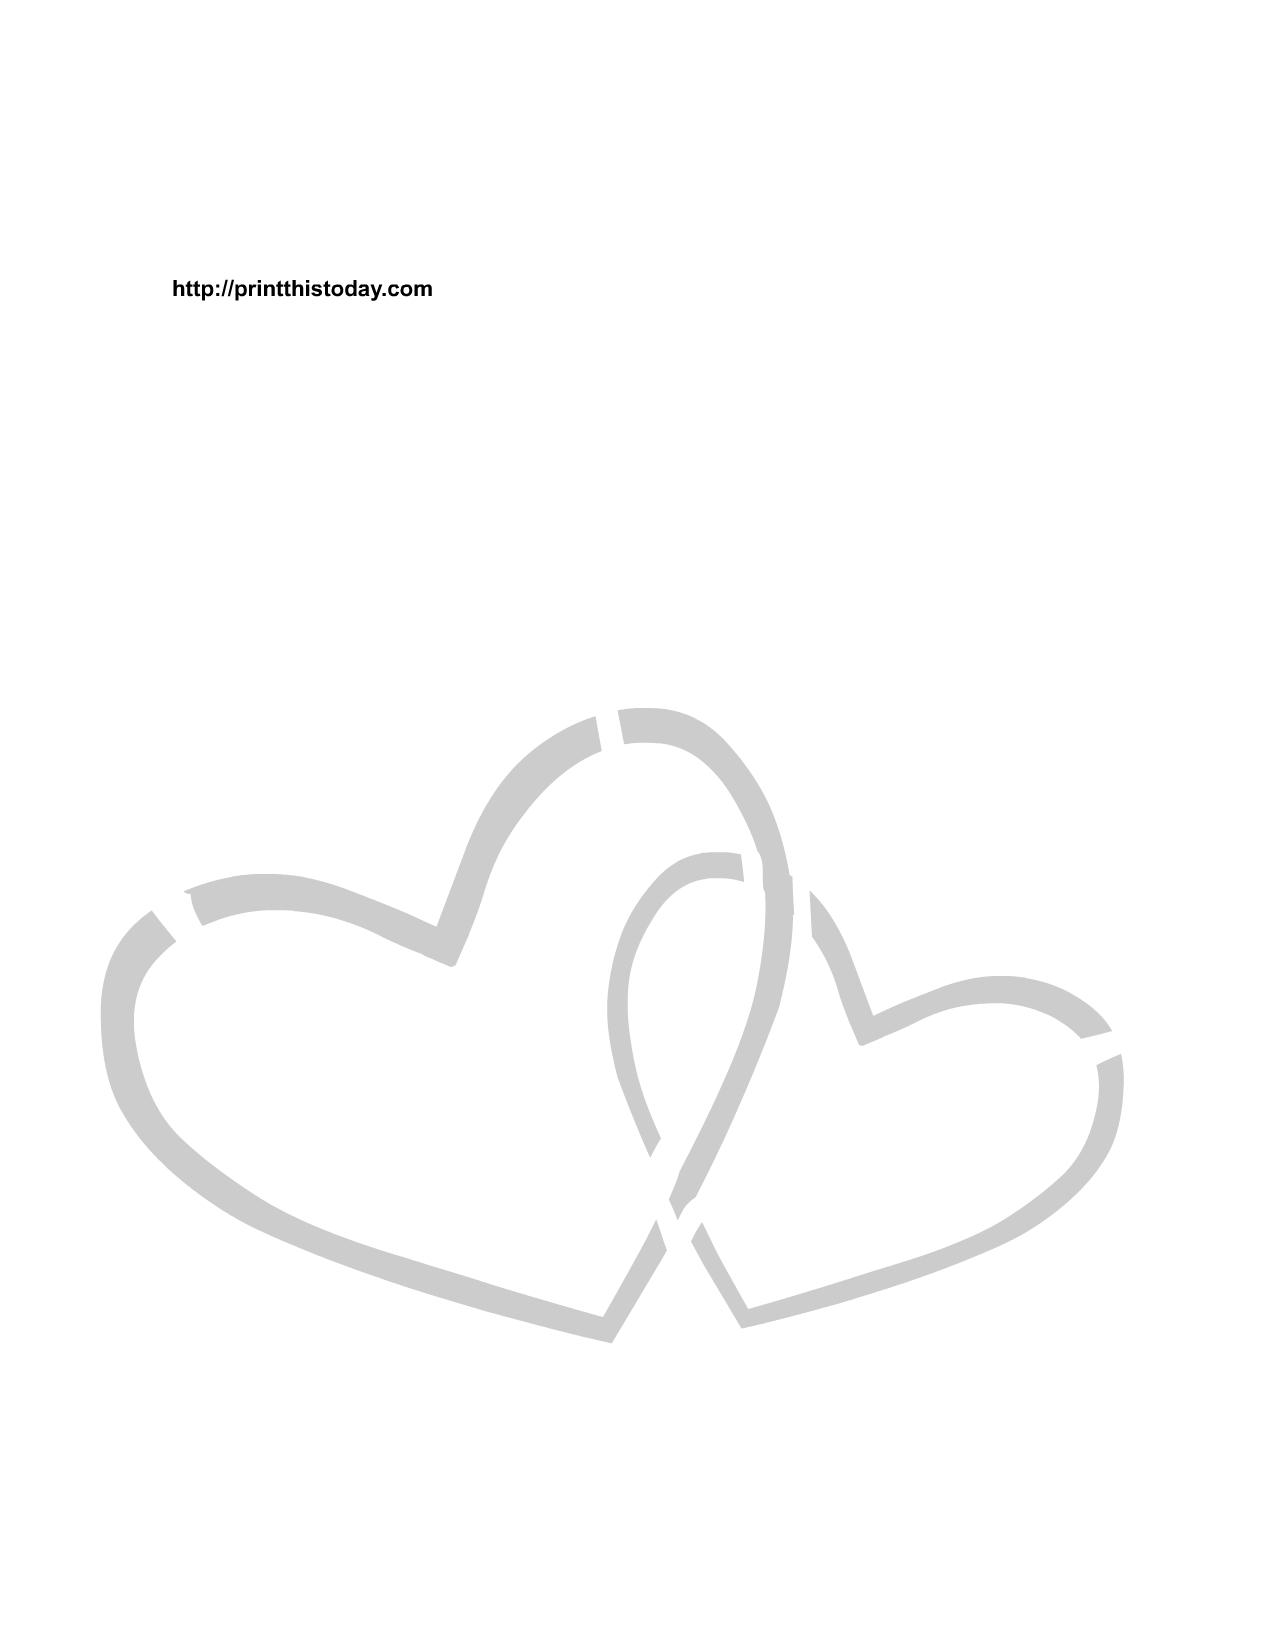 Free Printable Hearts Stencils - Free Printable Hearts